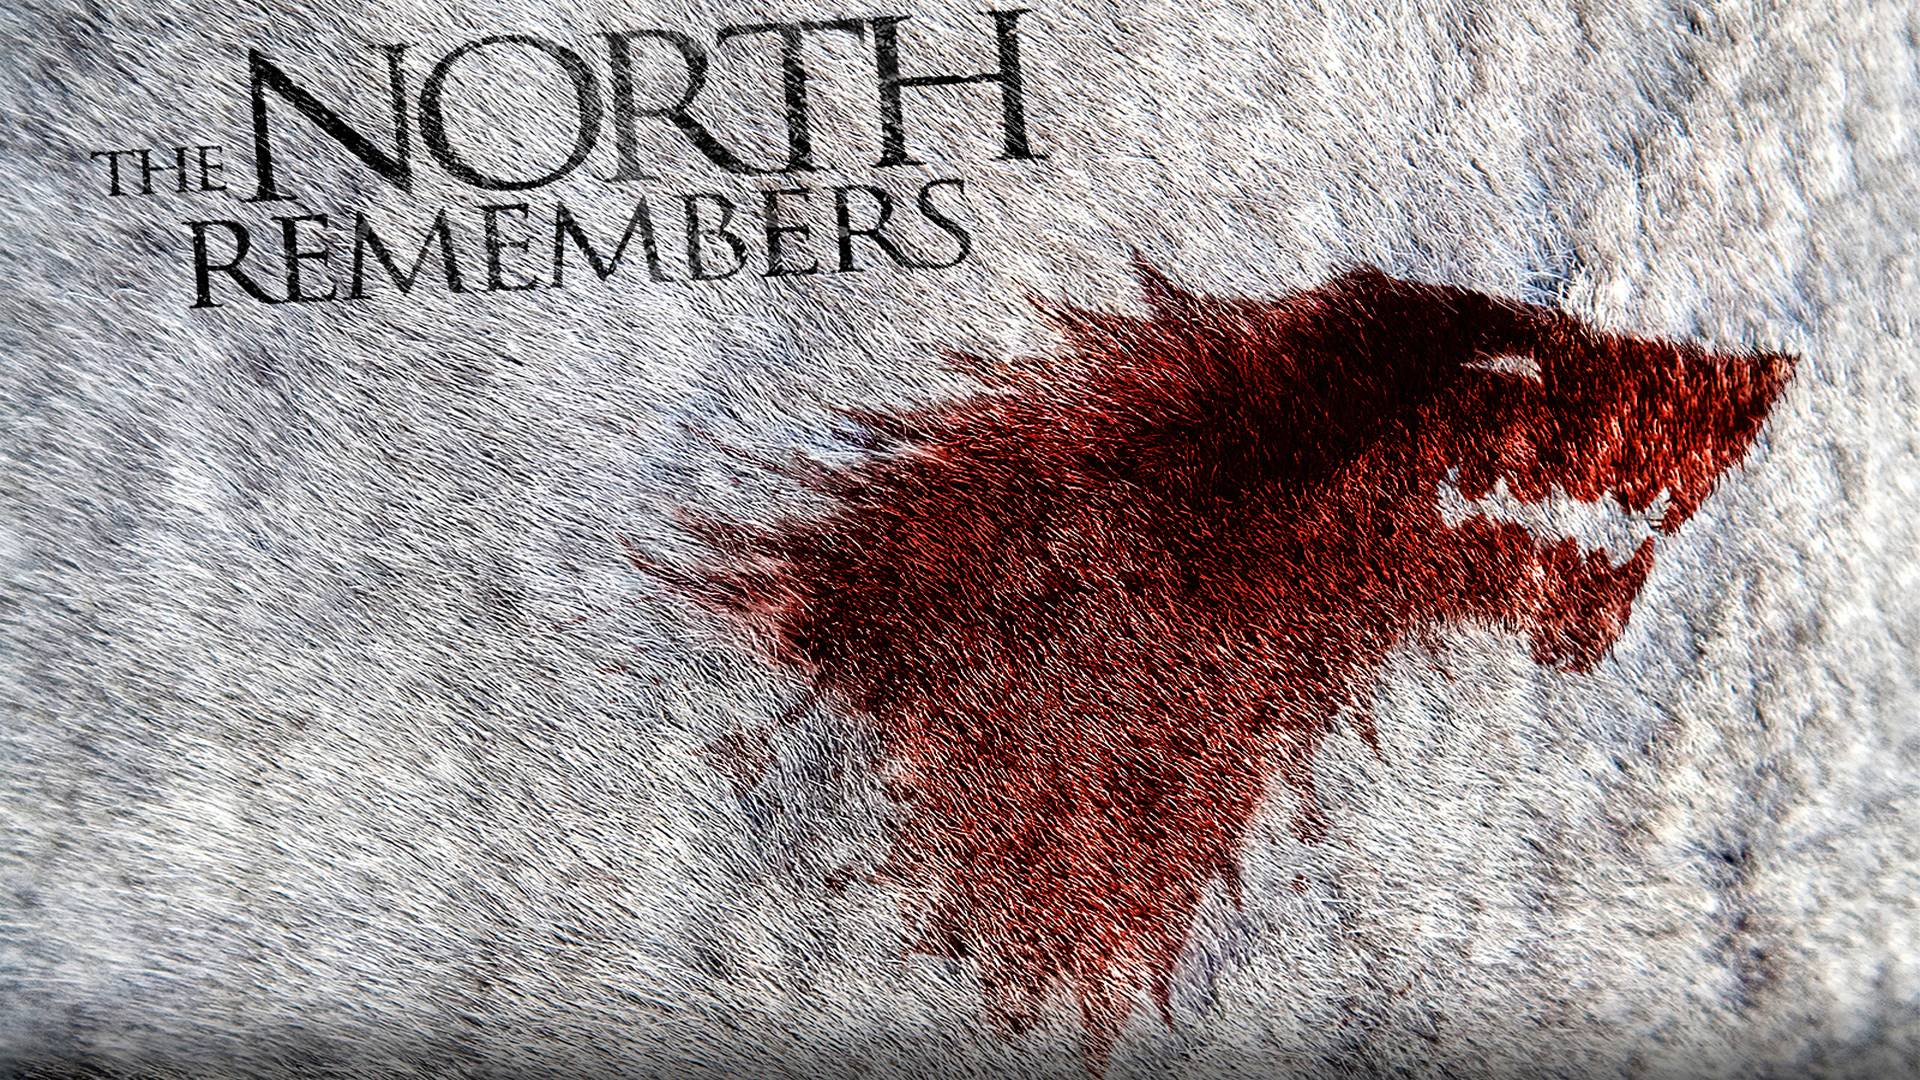 Game Of Thrones Stark Wallpapers Top Free Game Of Thrones Stark